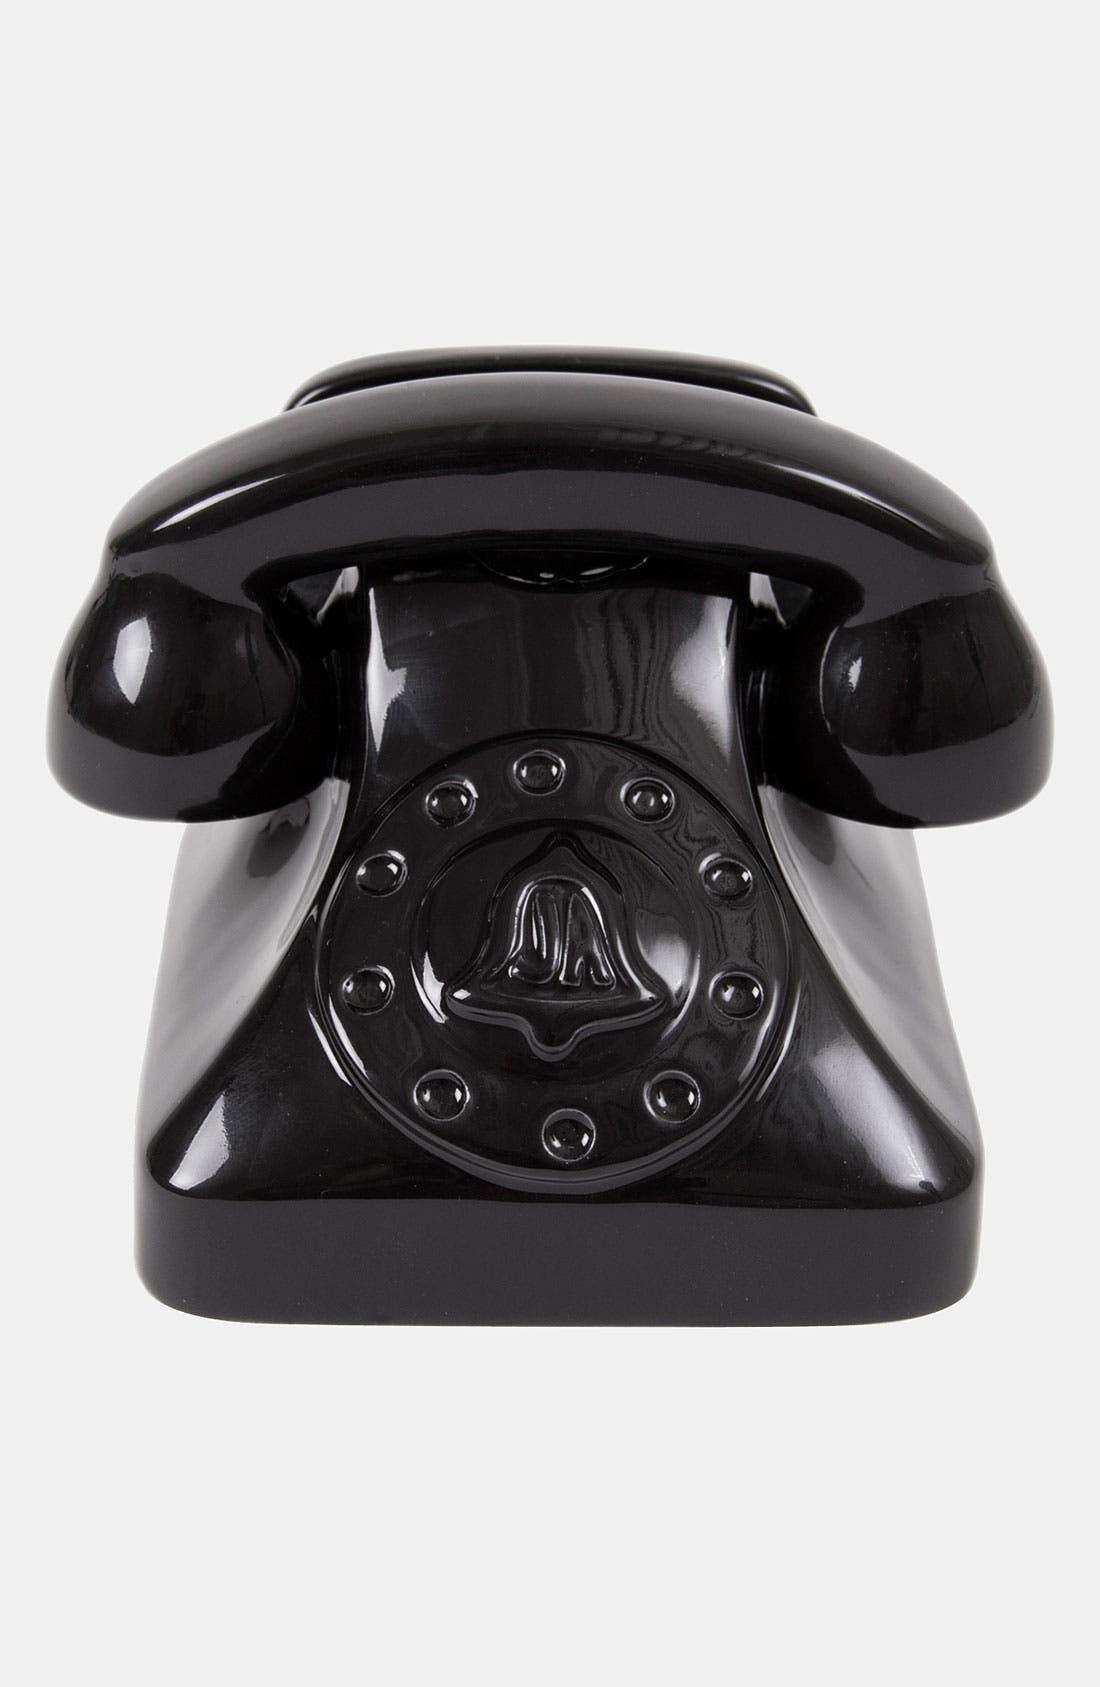 Alternate Image 1 Selected - Jonathan Adler Universal Smart Phone Dock (Nordstrom Exclusive)